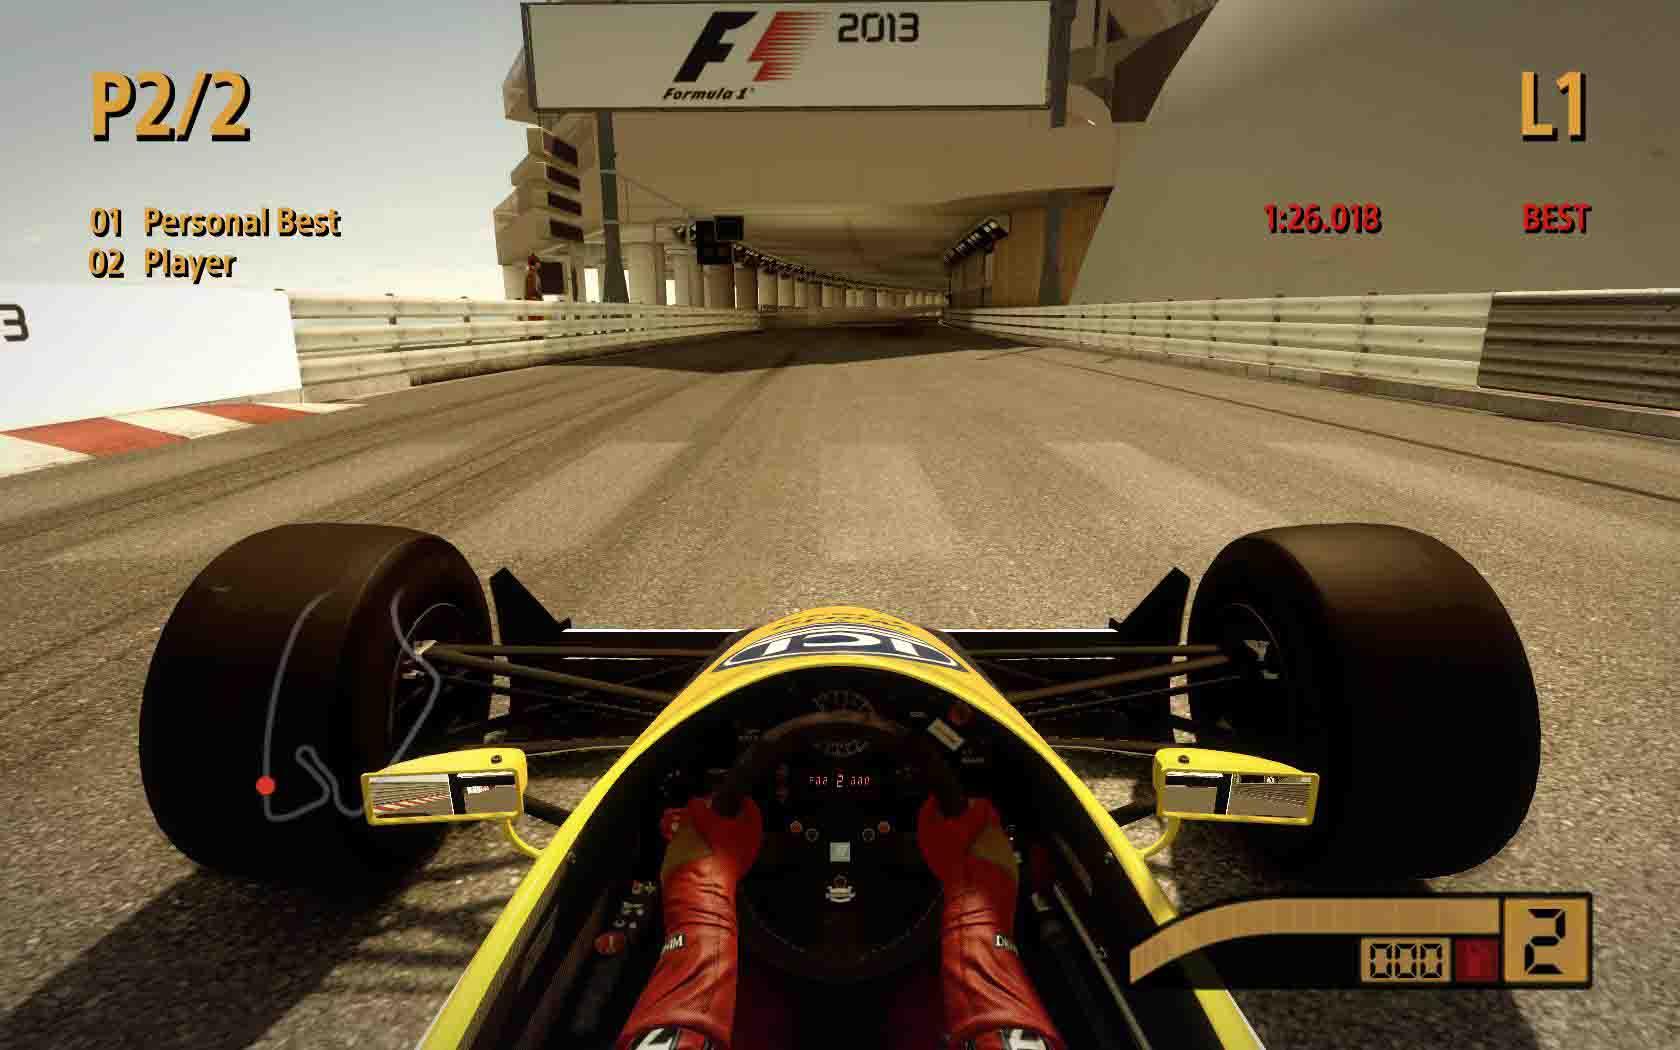 F1_2013 2013-11-05 03-48-23-29 copy.jpg